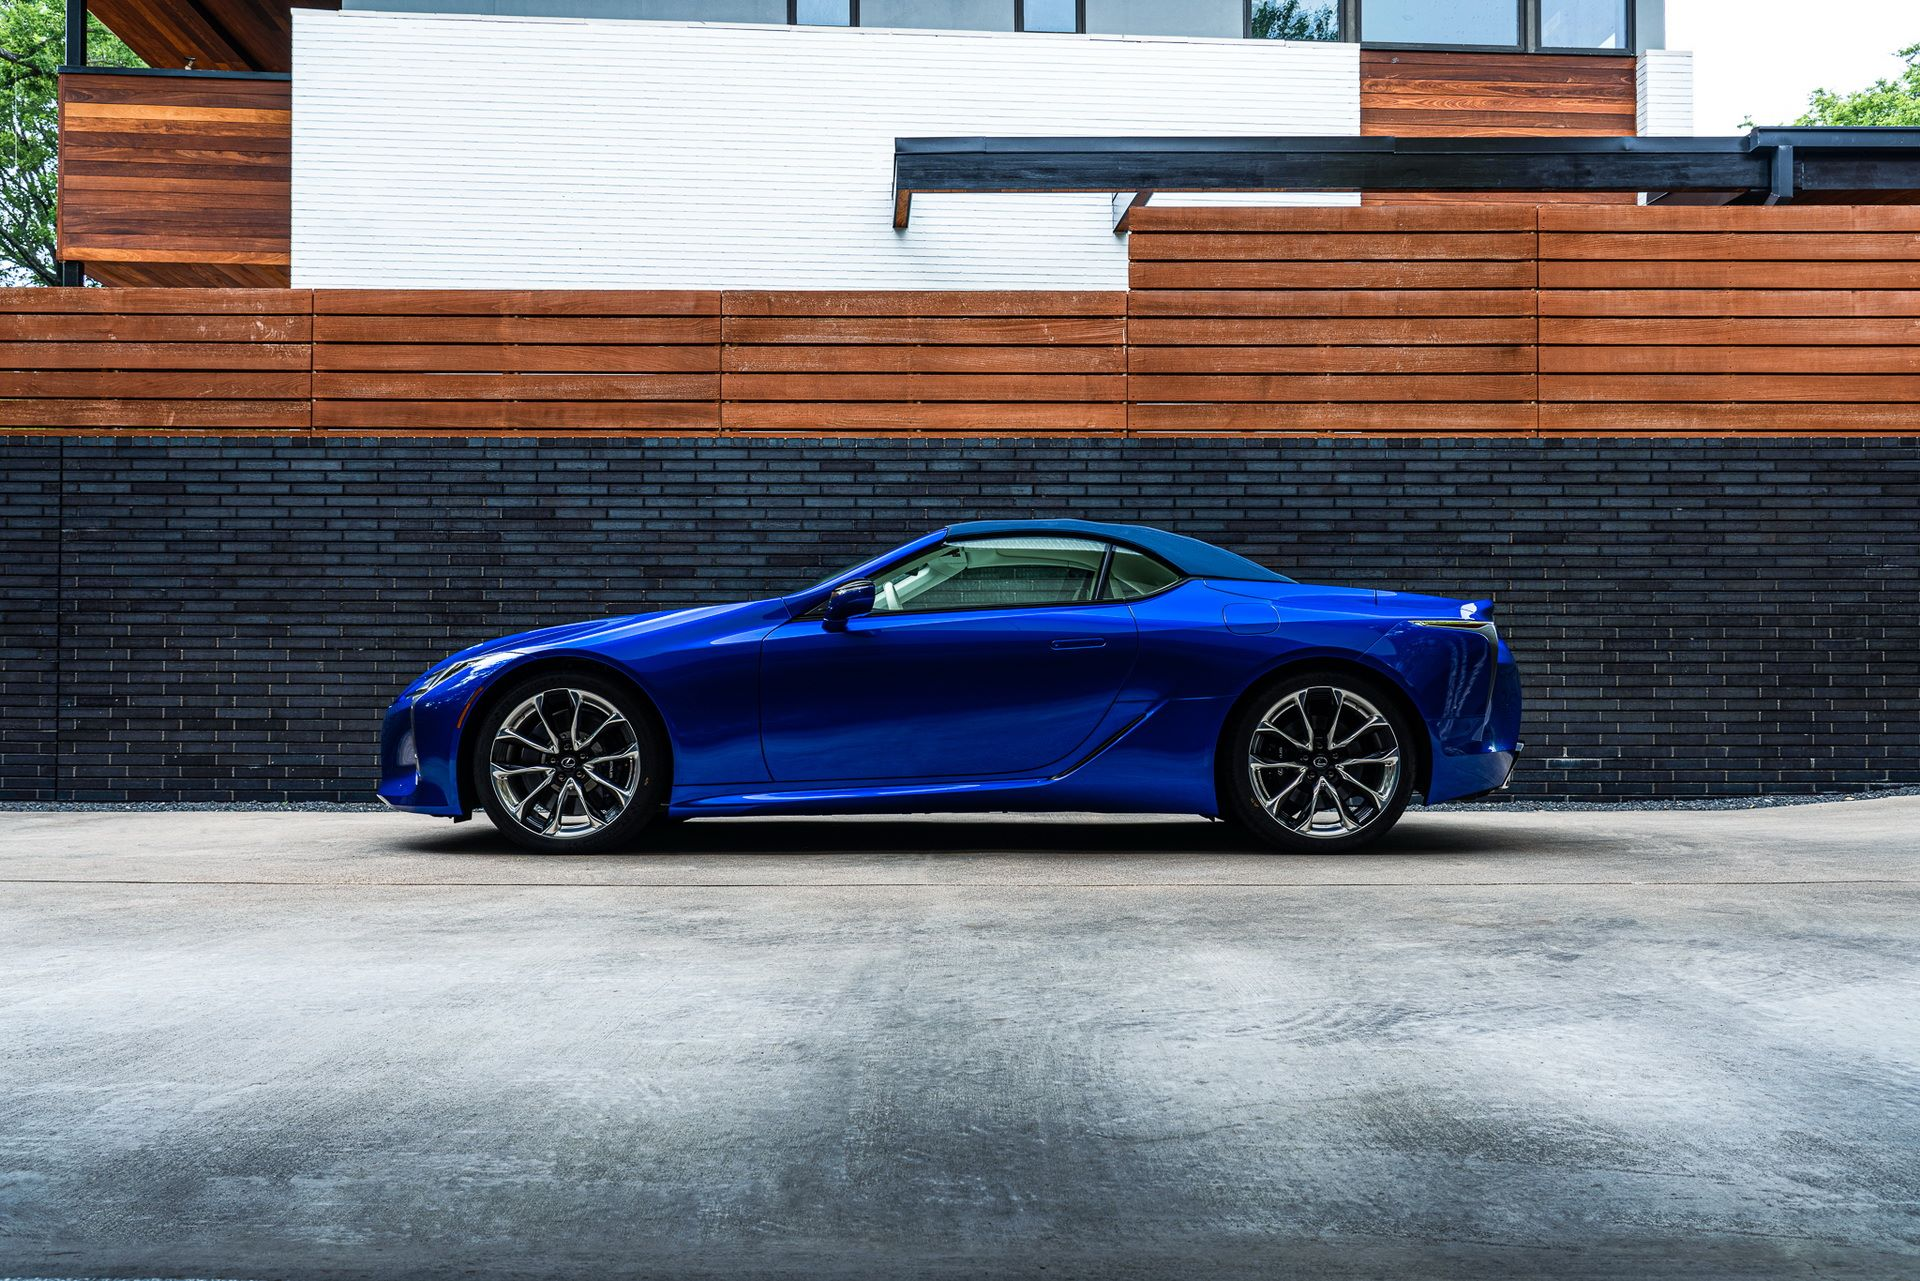 Lexus-LC-500-Convertible-Regatta-Edition-3